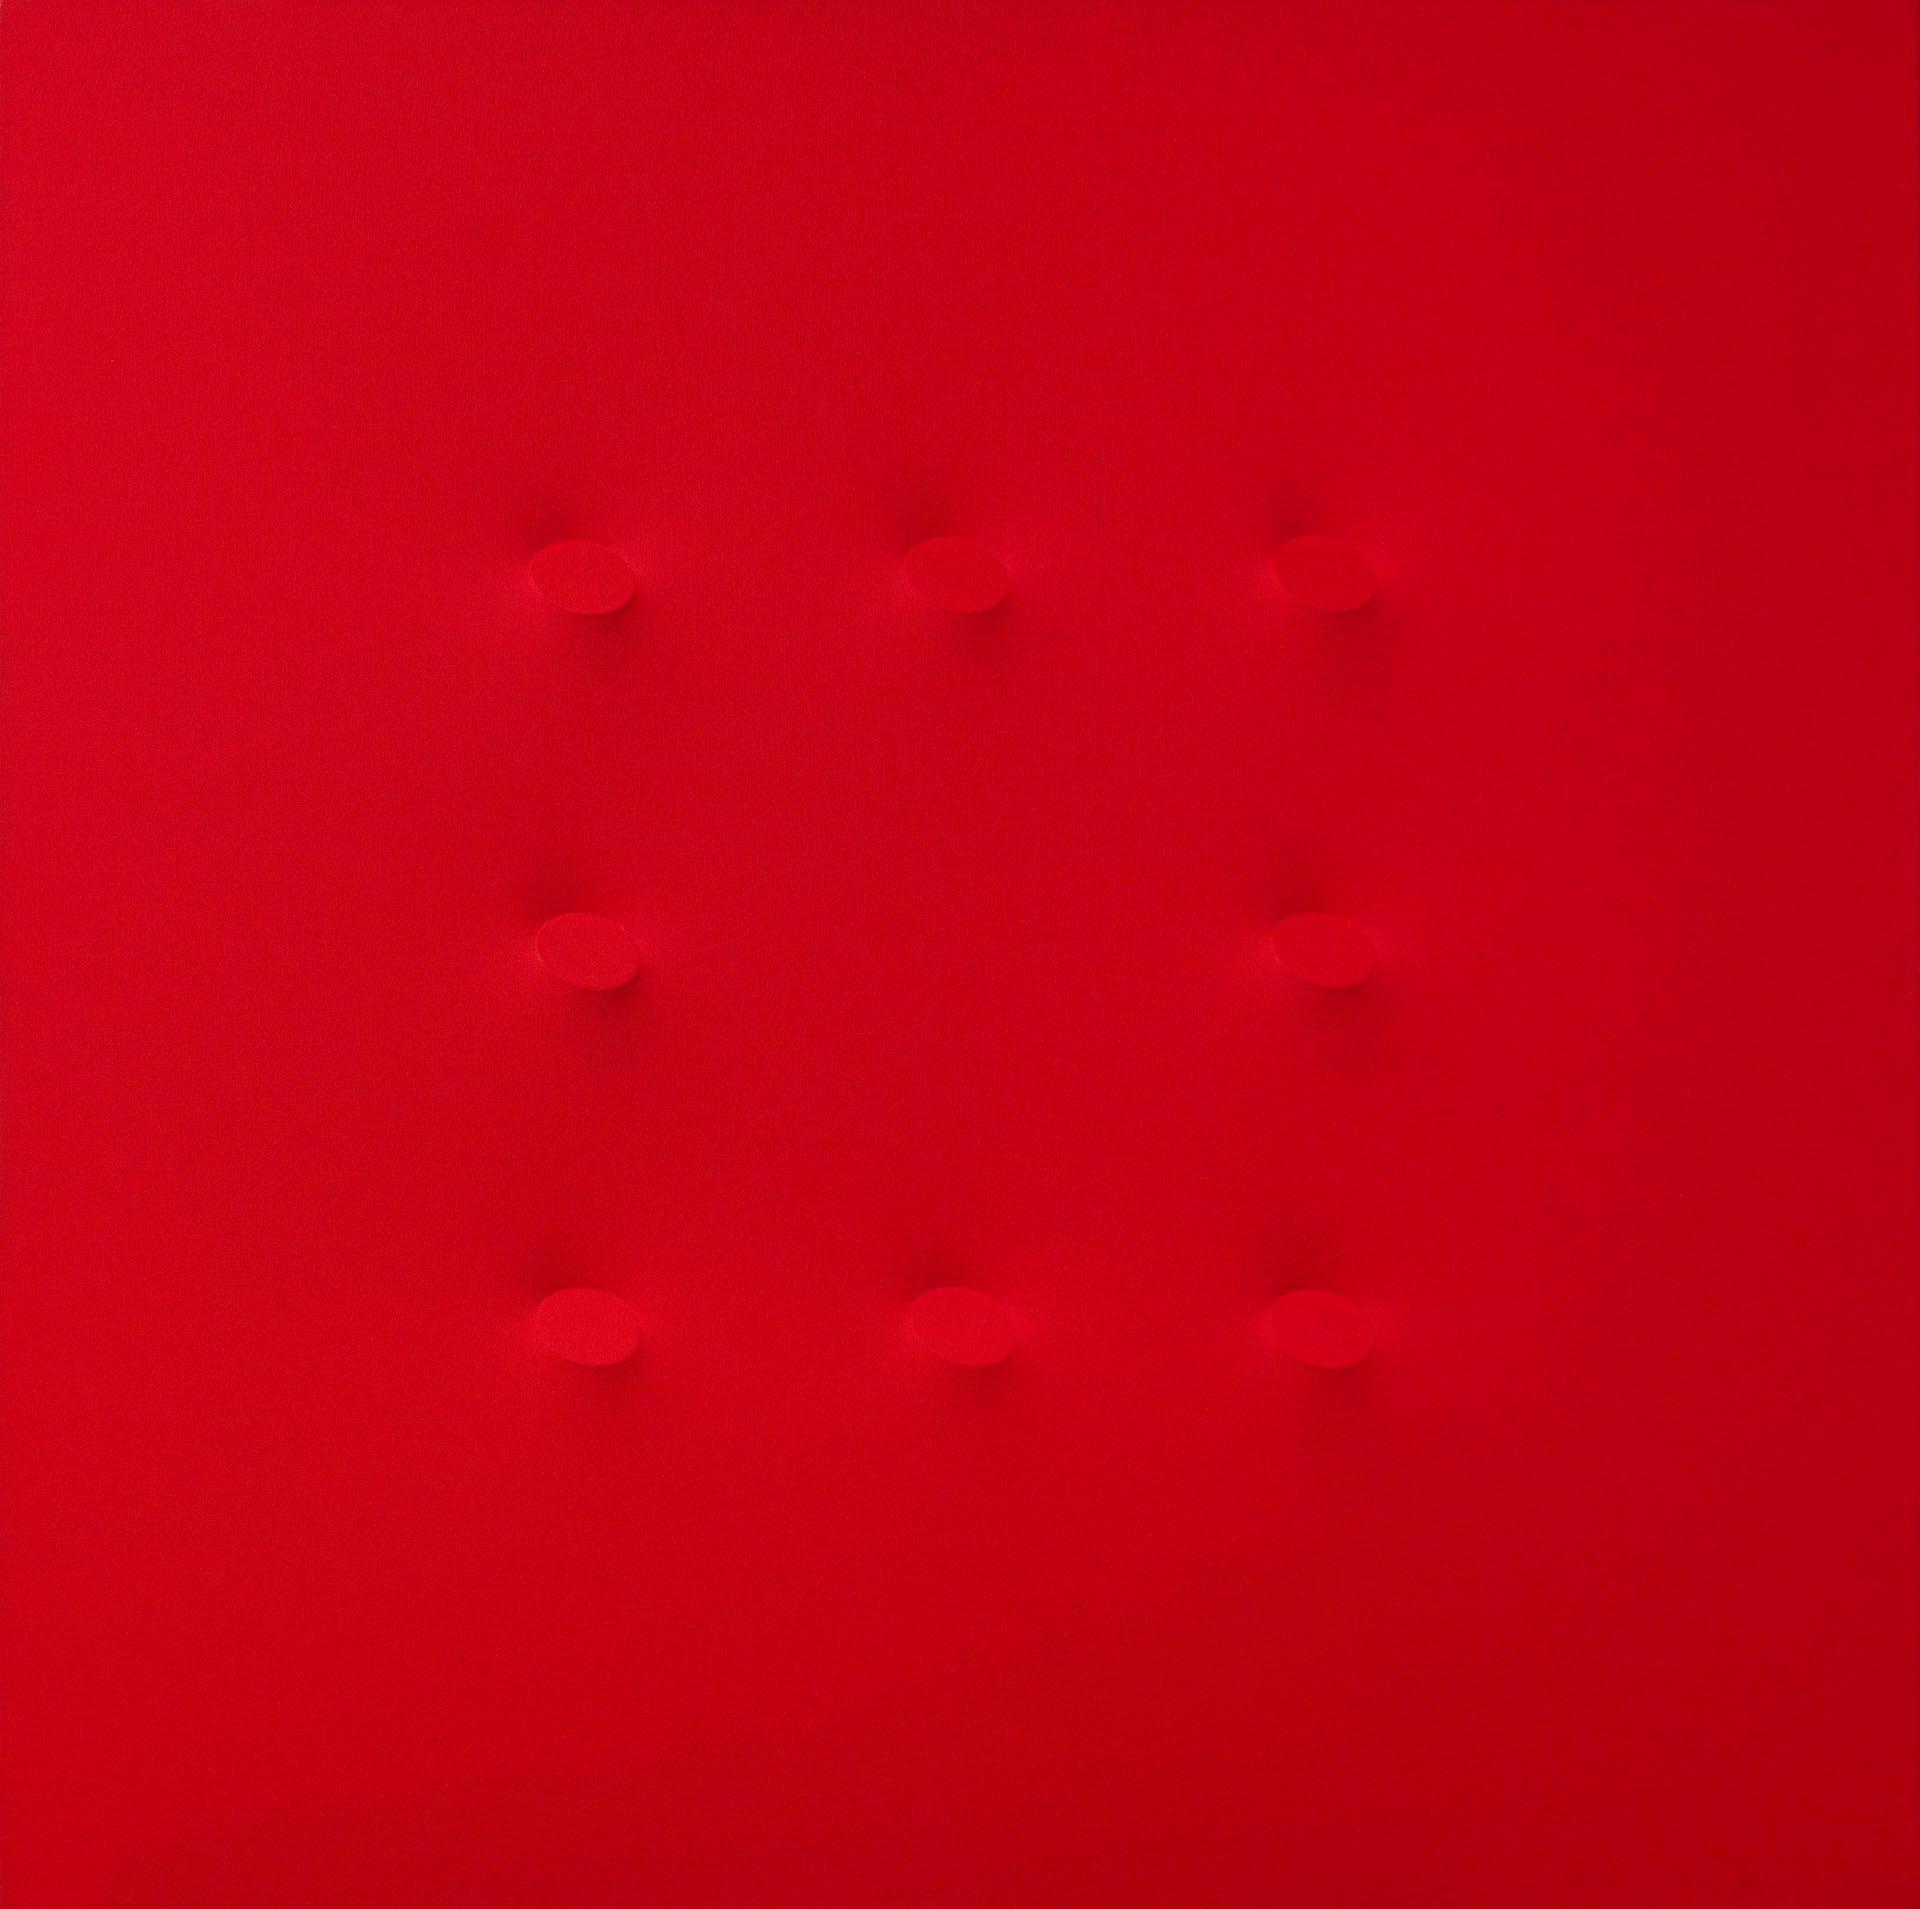 Simeti, 8 ovali rossi, 2015, 125x125 cm